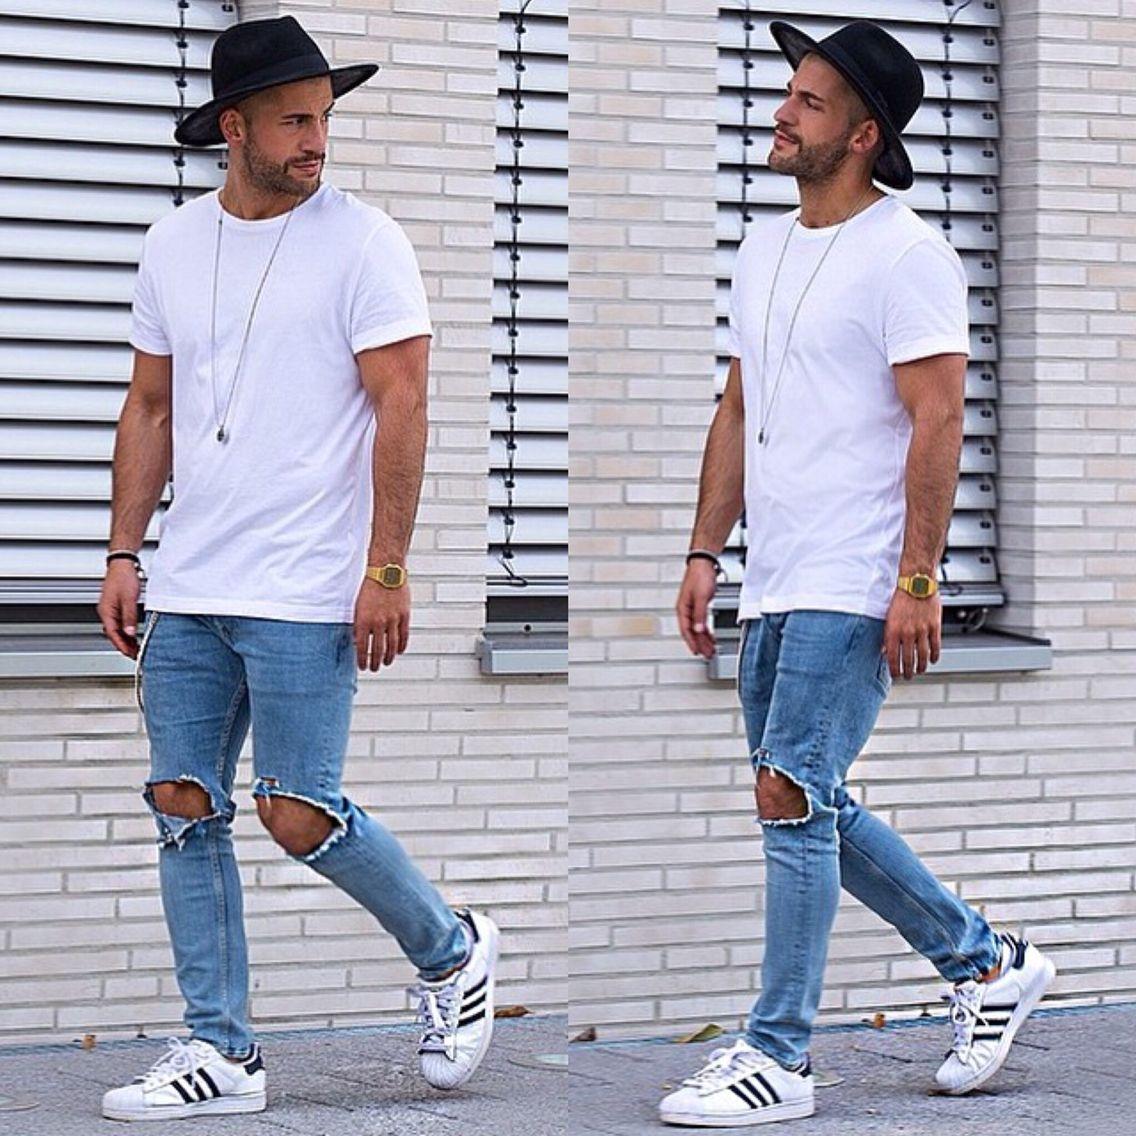 stylish boys men style casual outfit street kosta williams